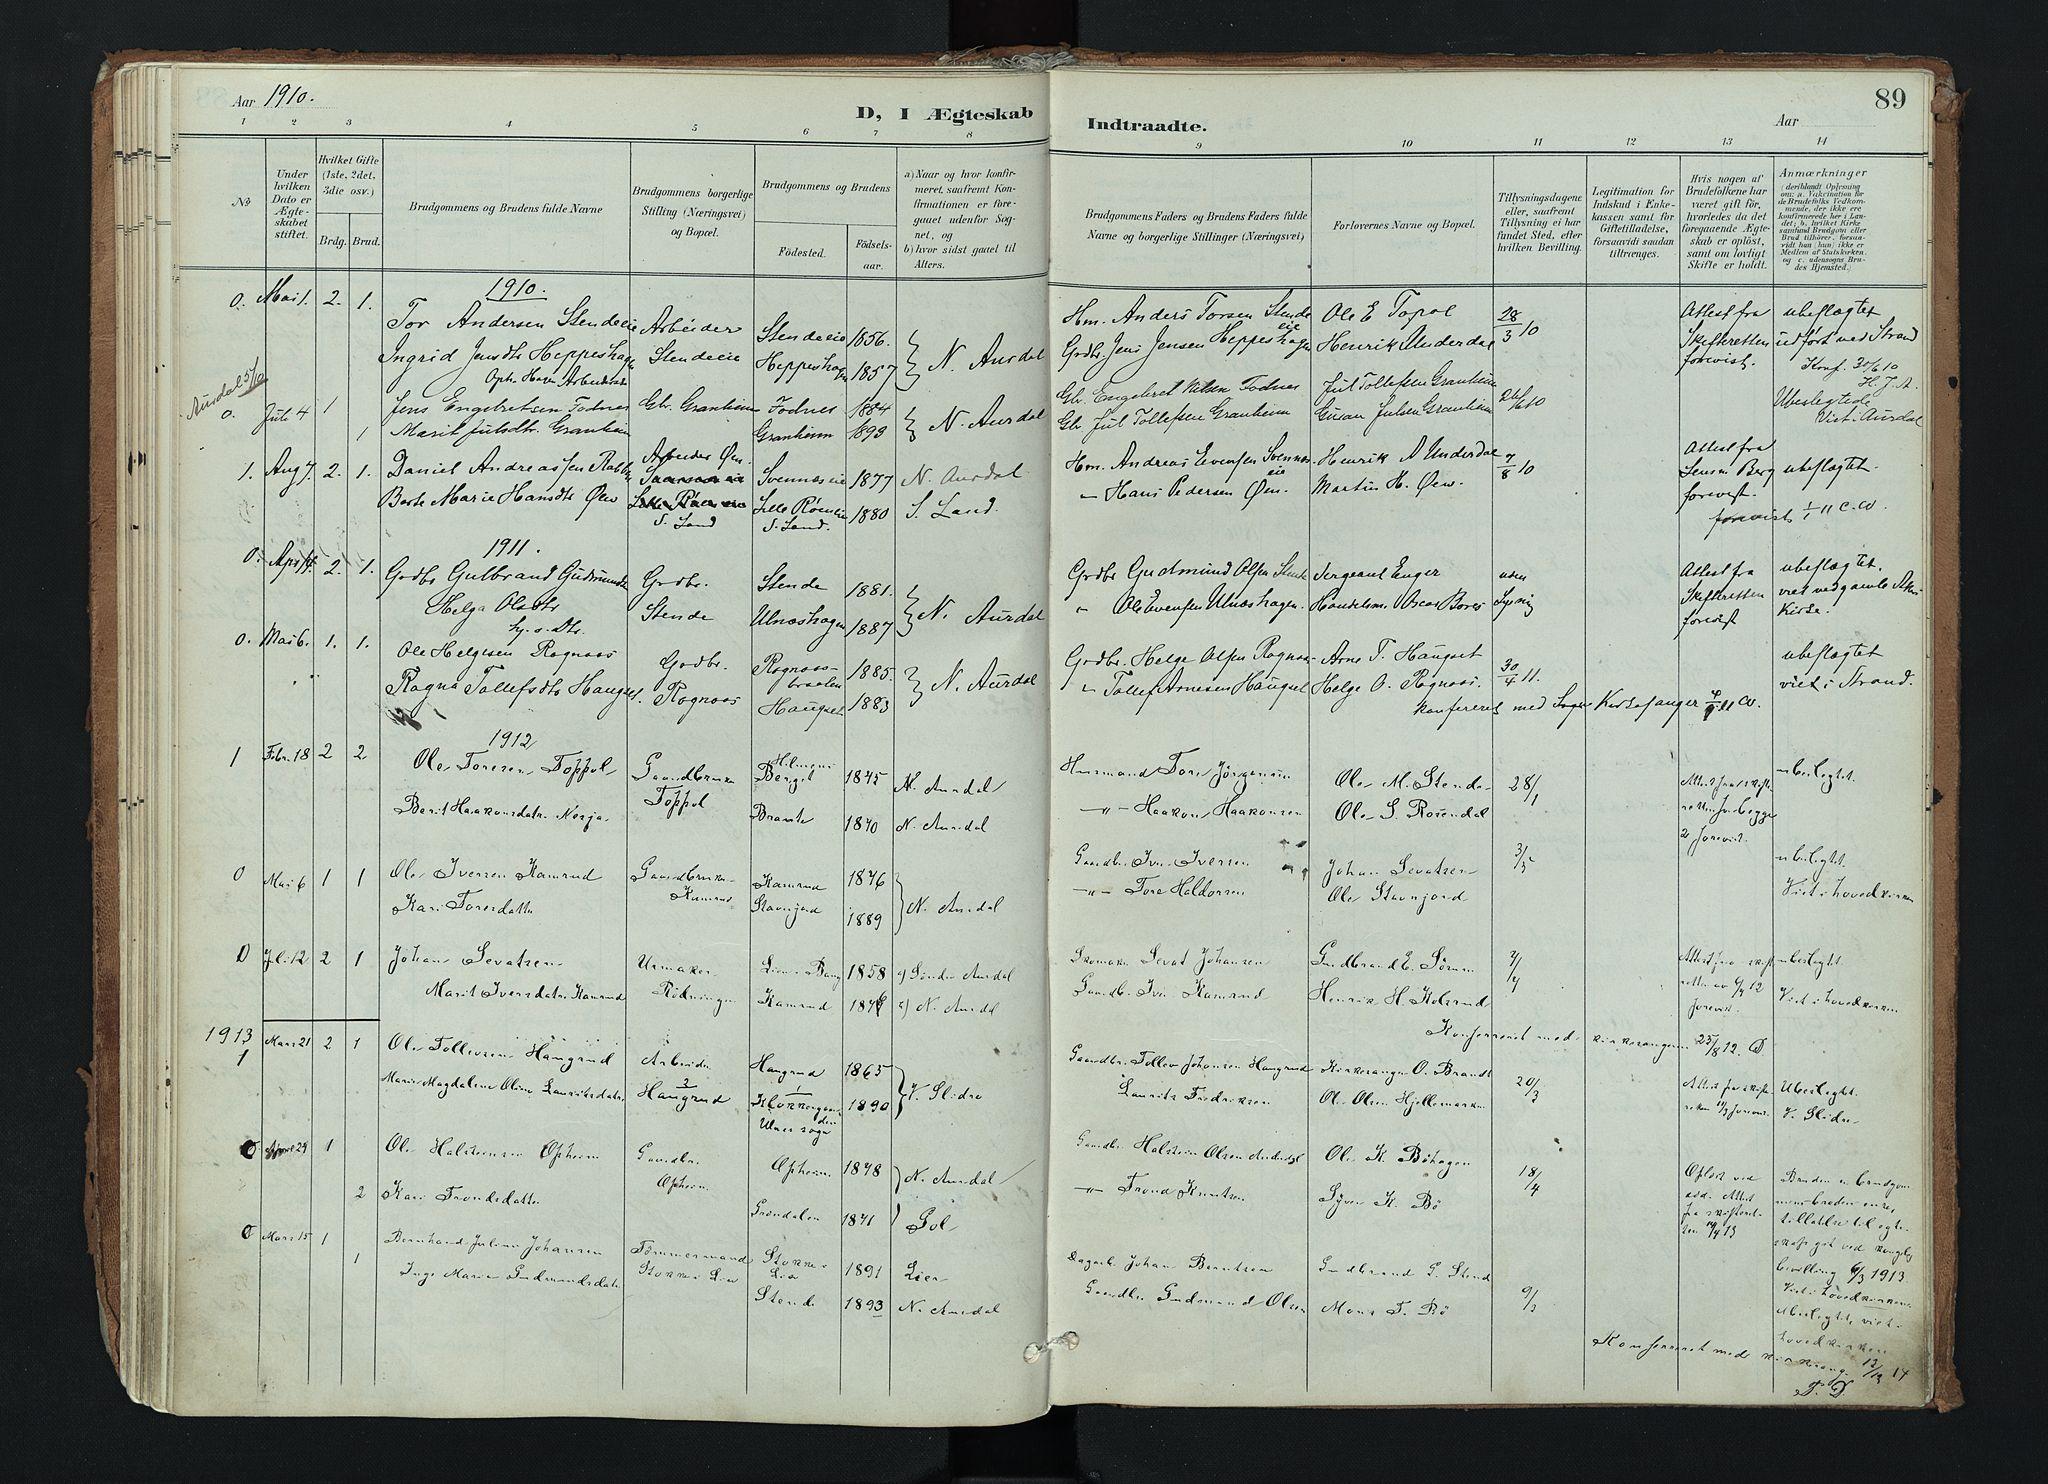 SAH, Nord-Aurdal prestekontor, Ministerialbok nr. 17, 1897-1926, s. 89